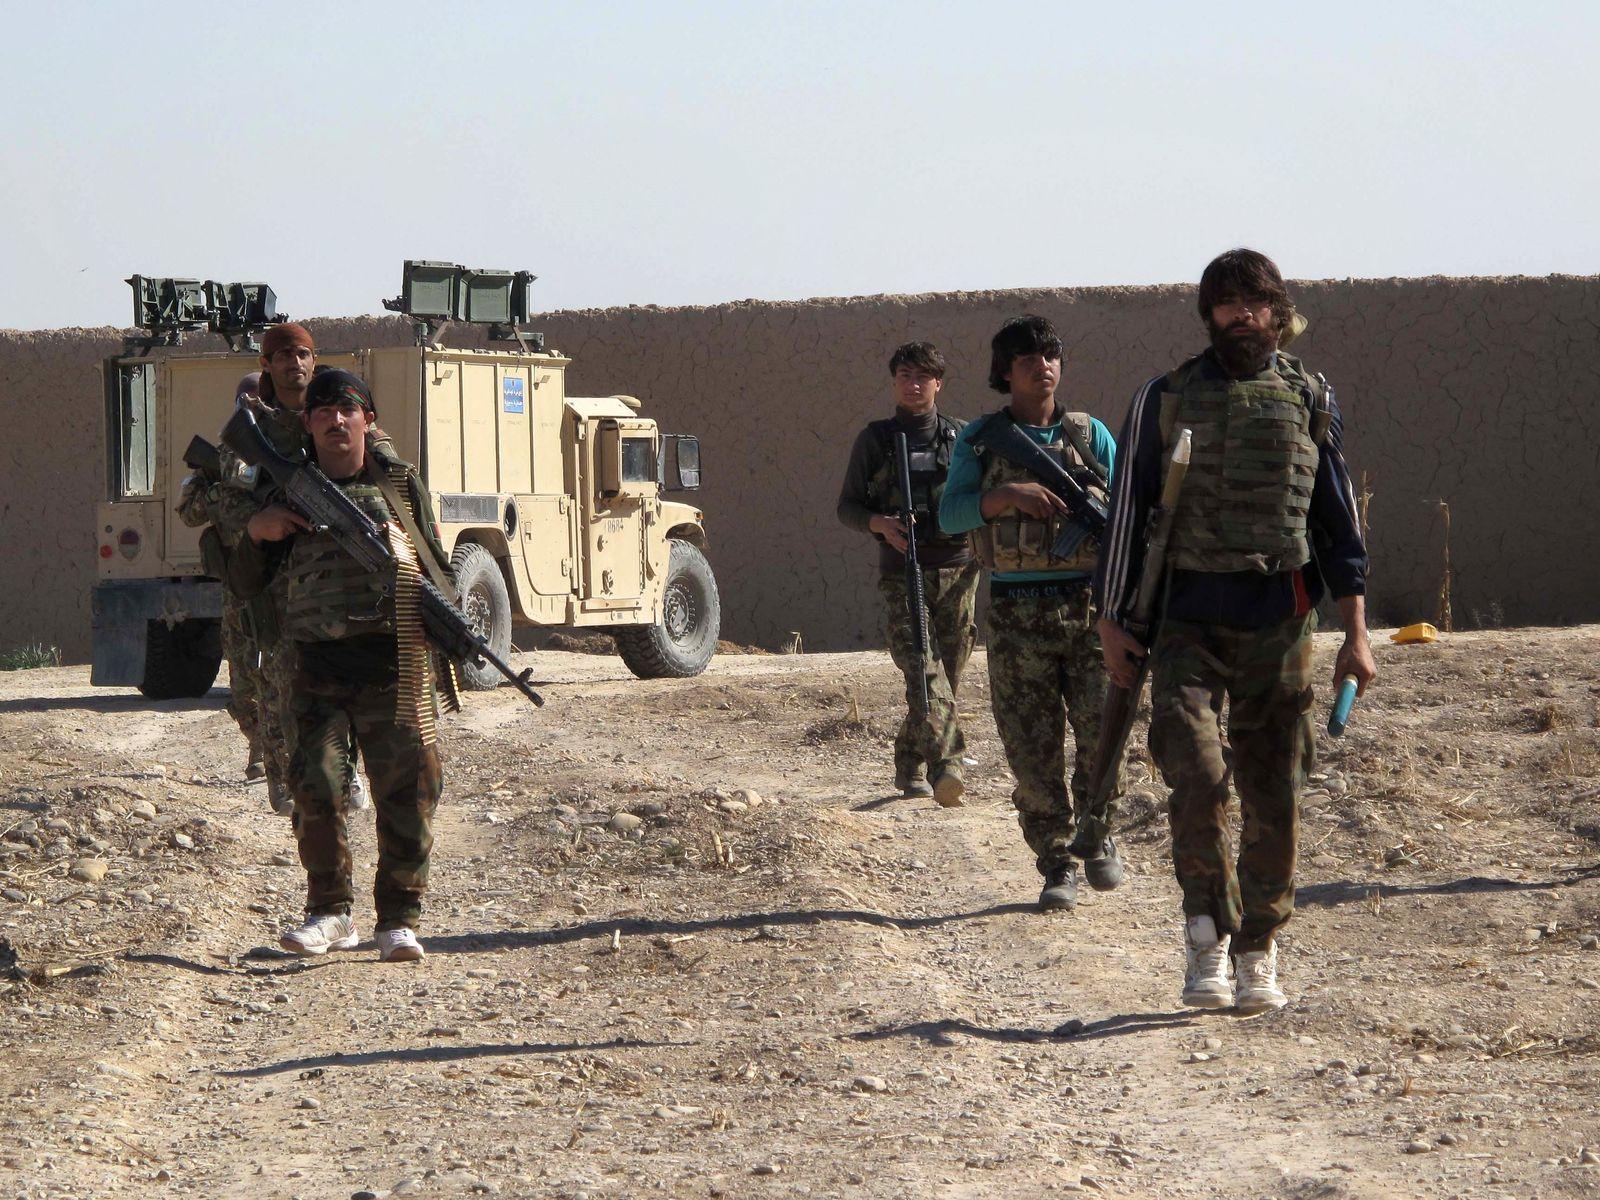 Helmand/Sangin/Afghanistan